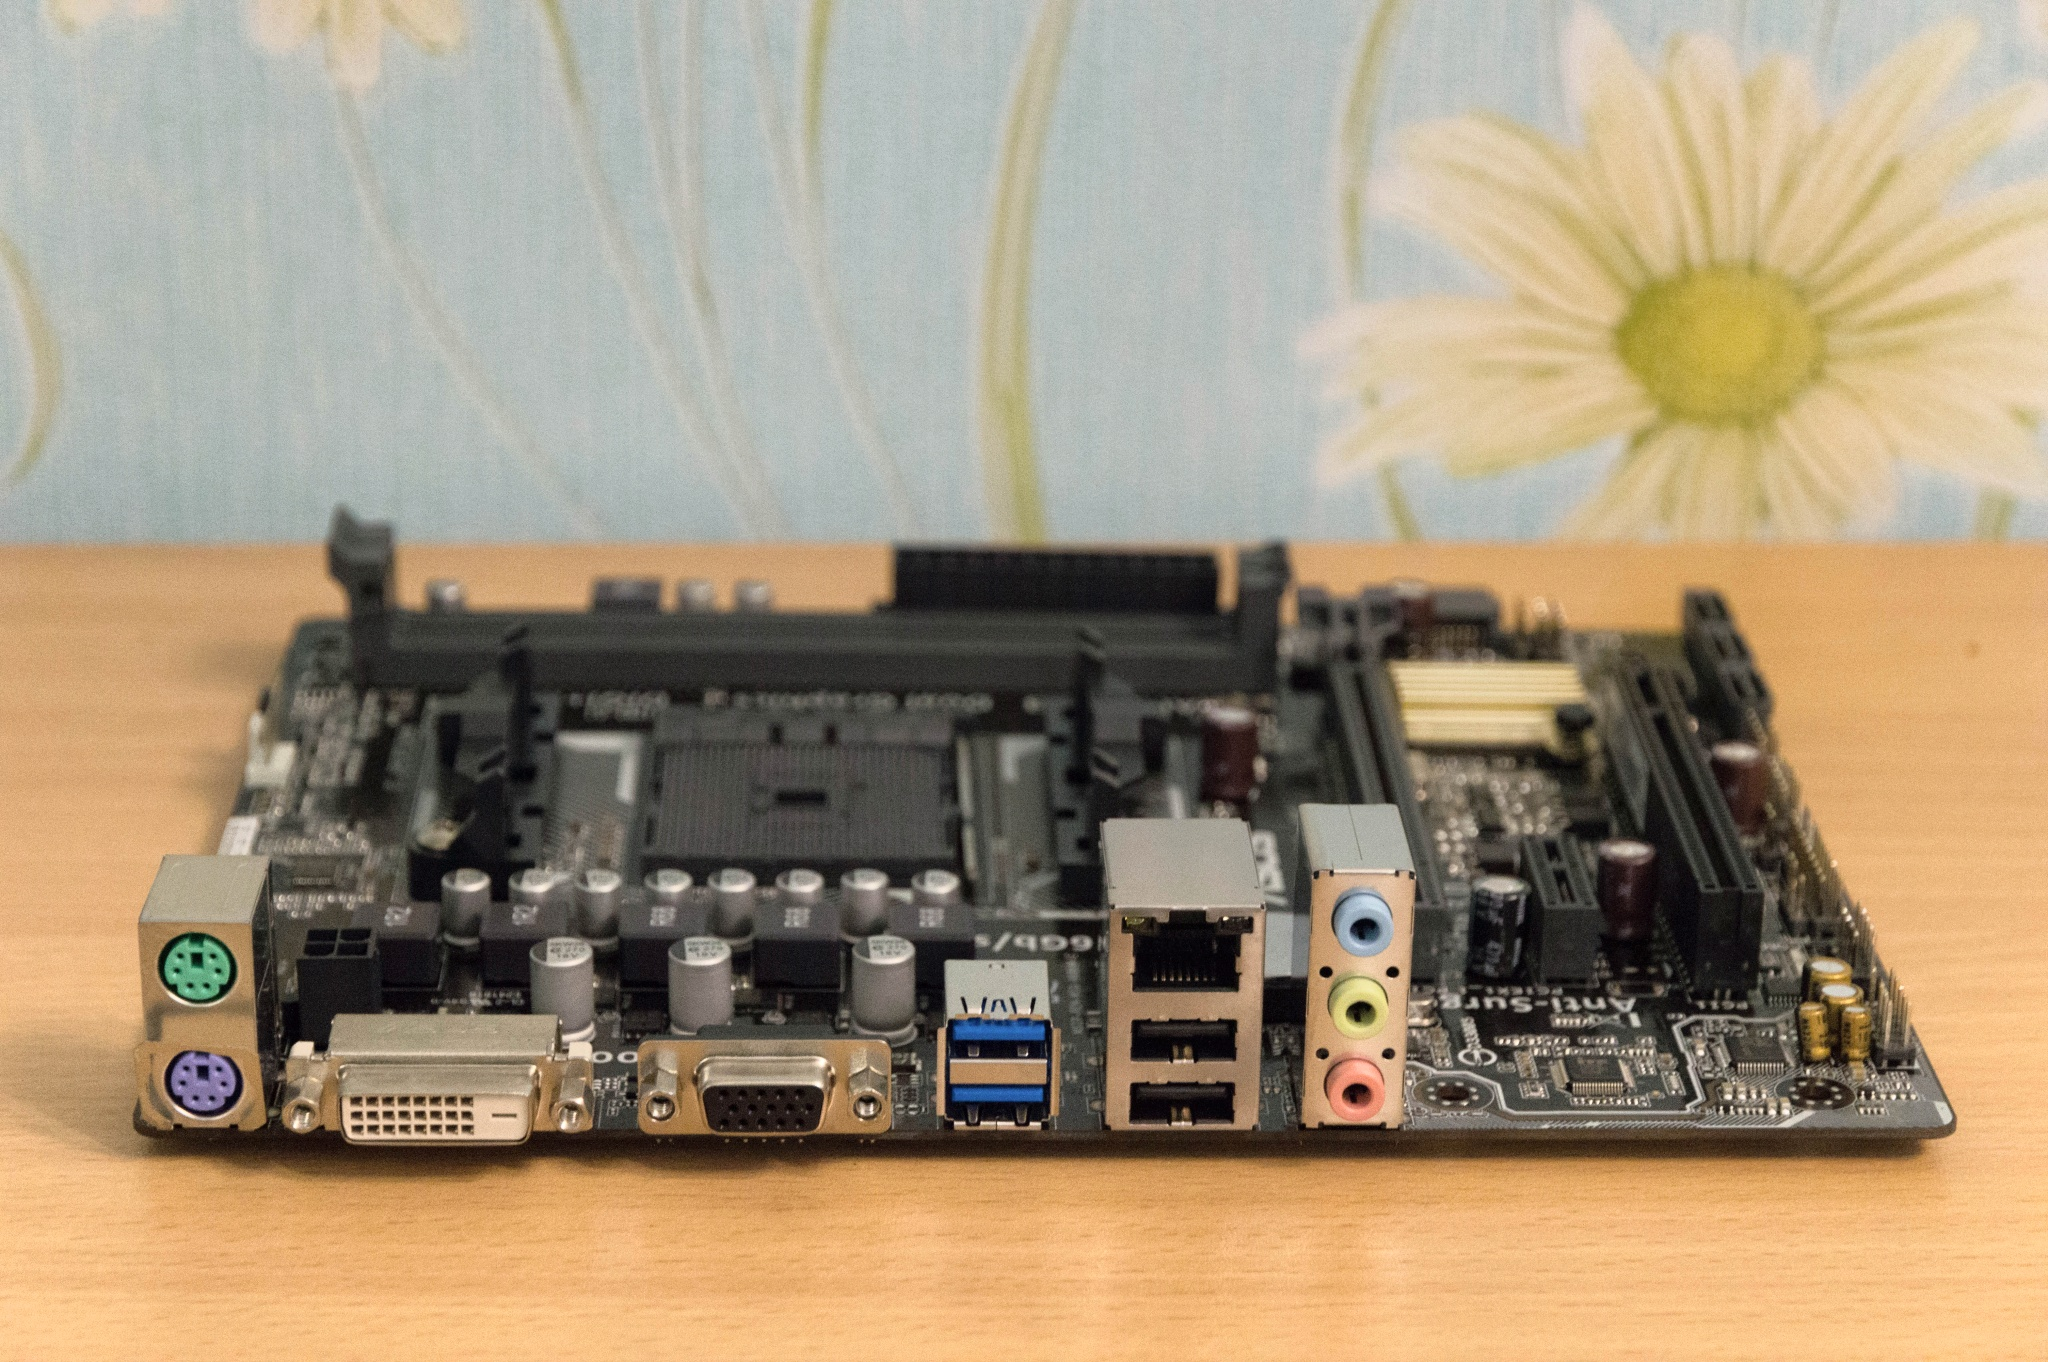 Asus A68hm K Fm2 Motherboard Socket Microatx 6